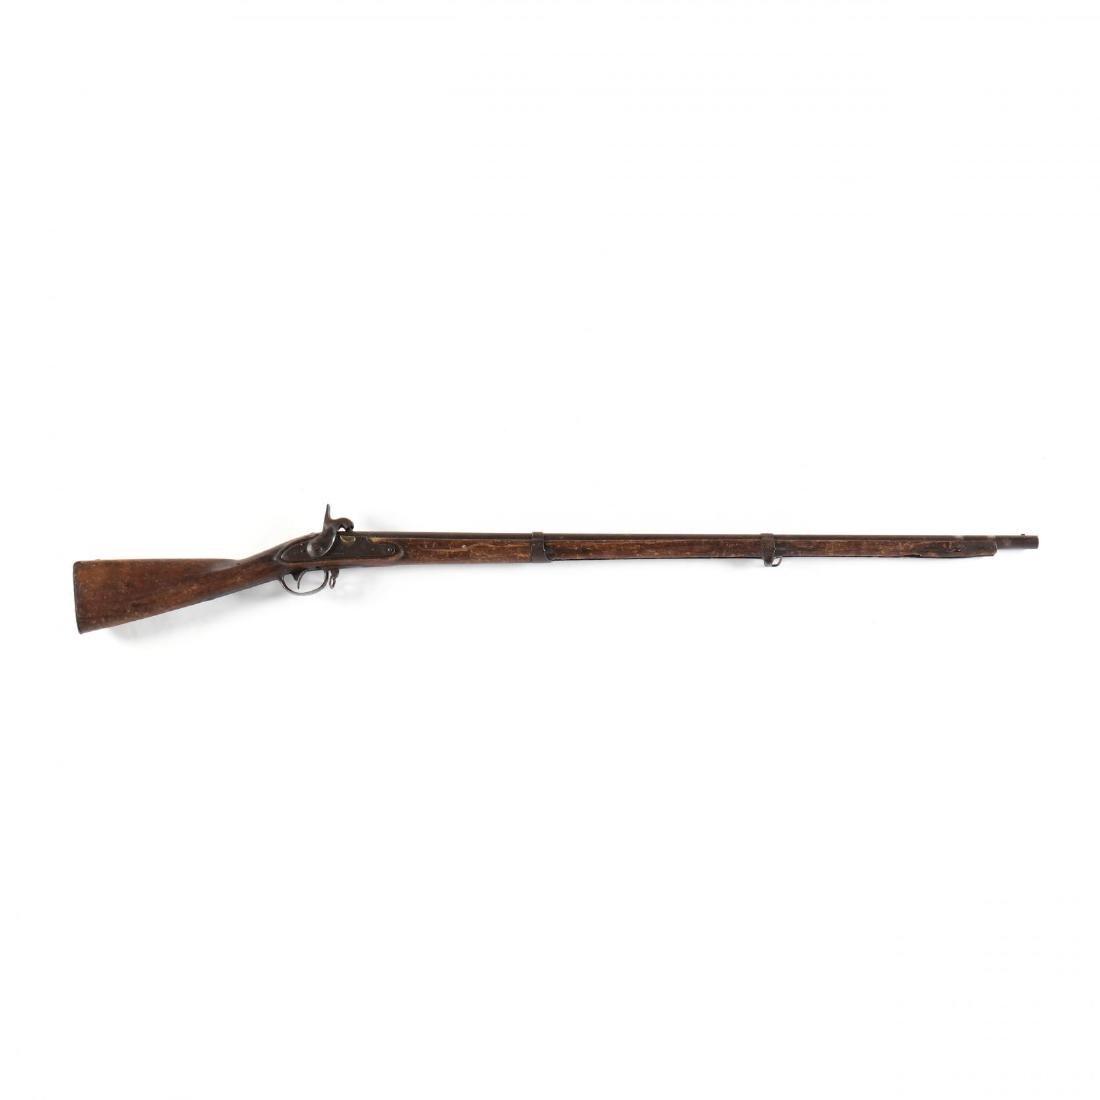 U.S. Model 1816 Flintlock Musket Converted to